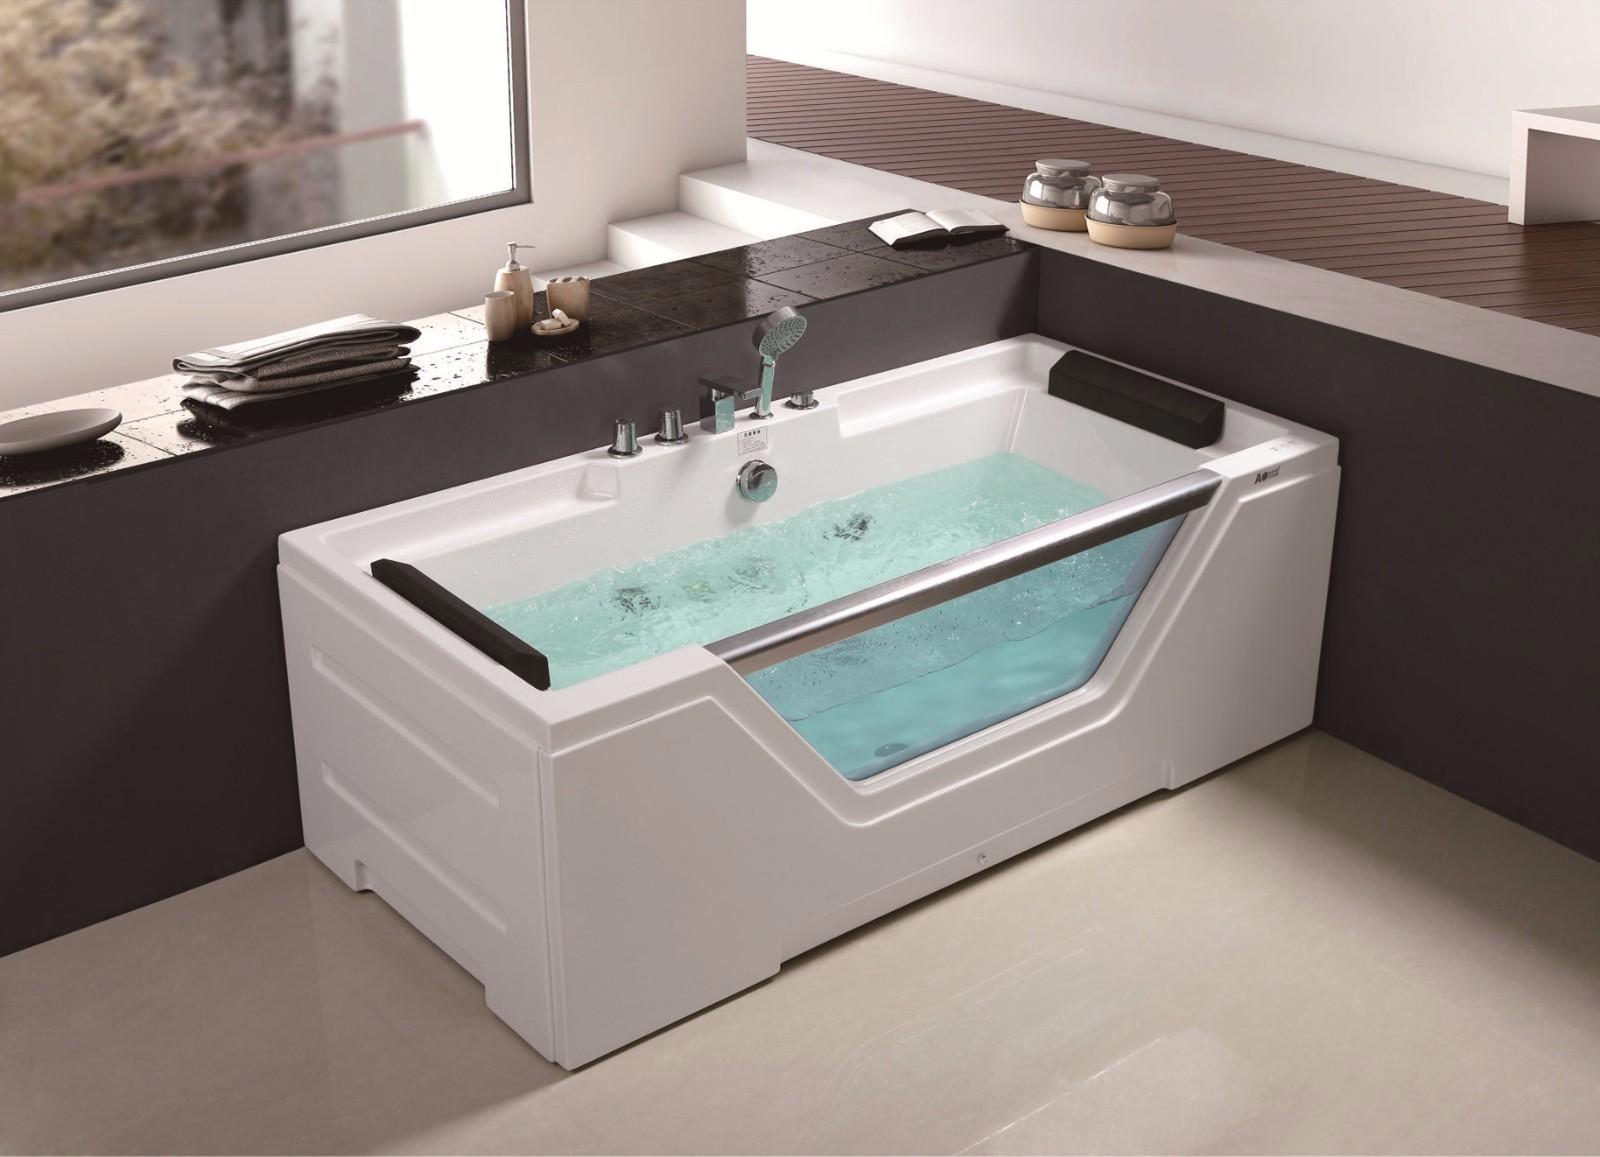 C433 C434 C435  Acrylic Glass Jetted Hot Sale Tub Bathroom Bathtub with Cheap Price.jpg